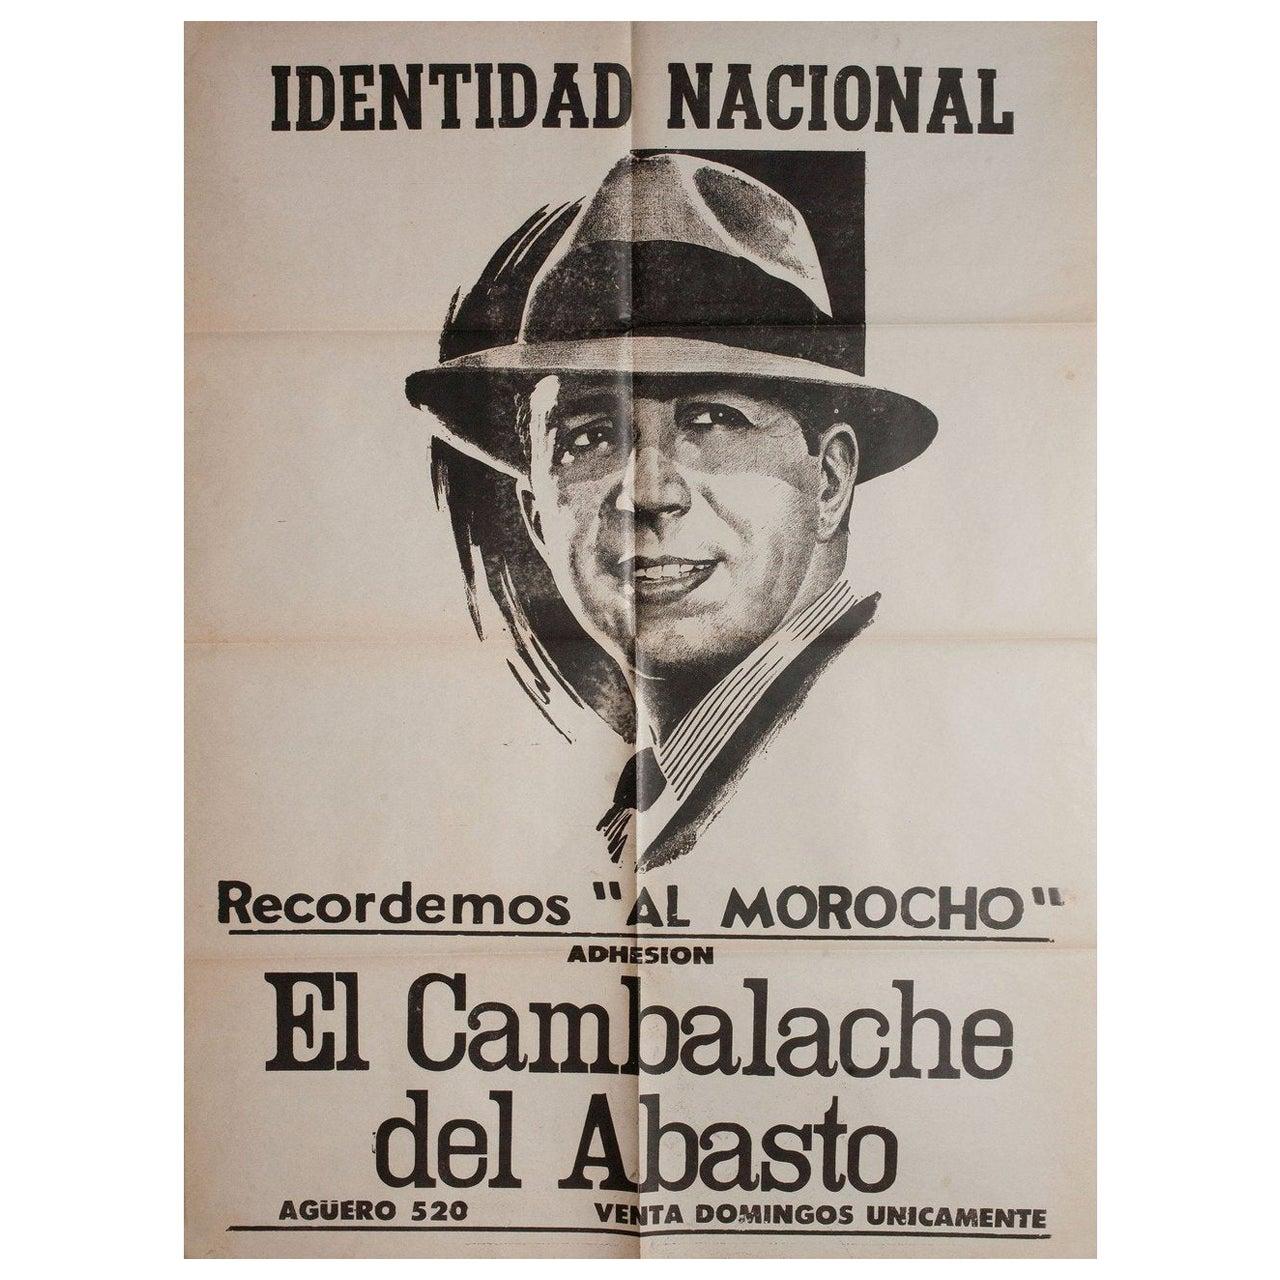 Carlos Gardel 1930s Argentine Poster